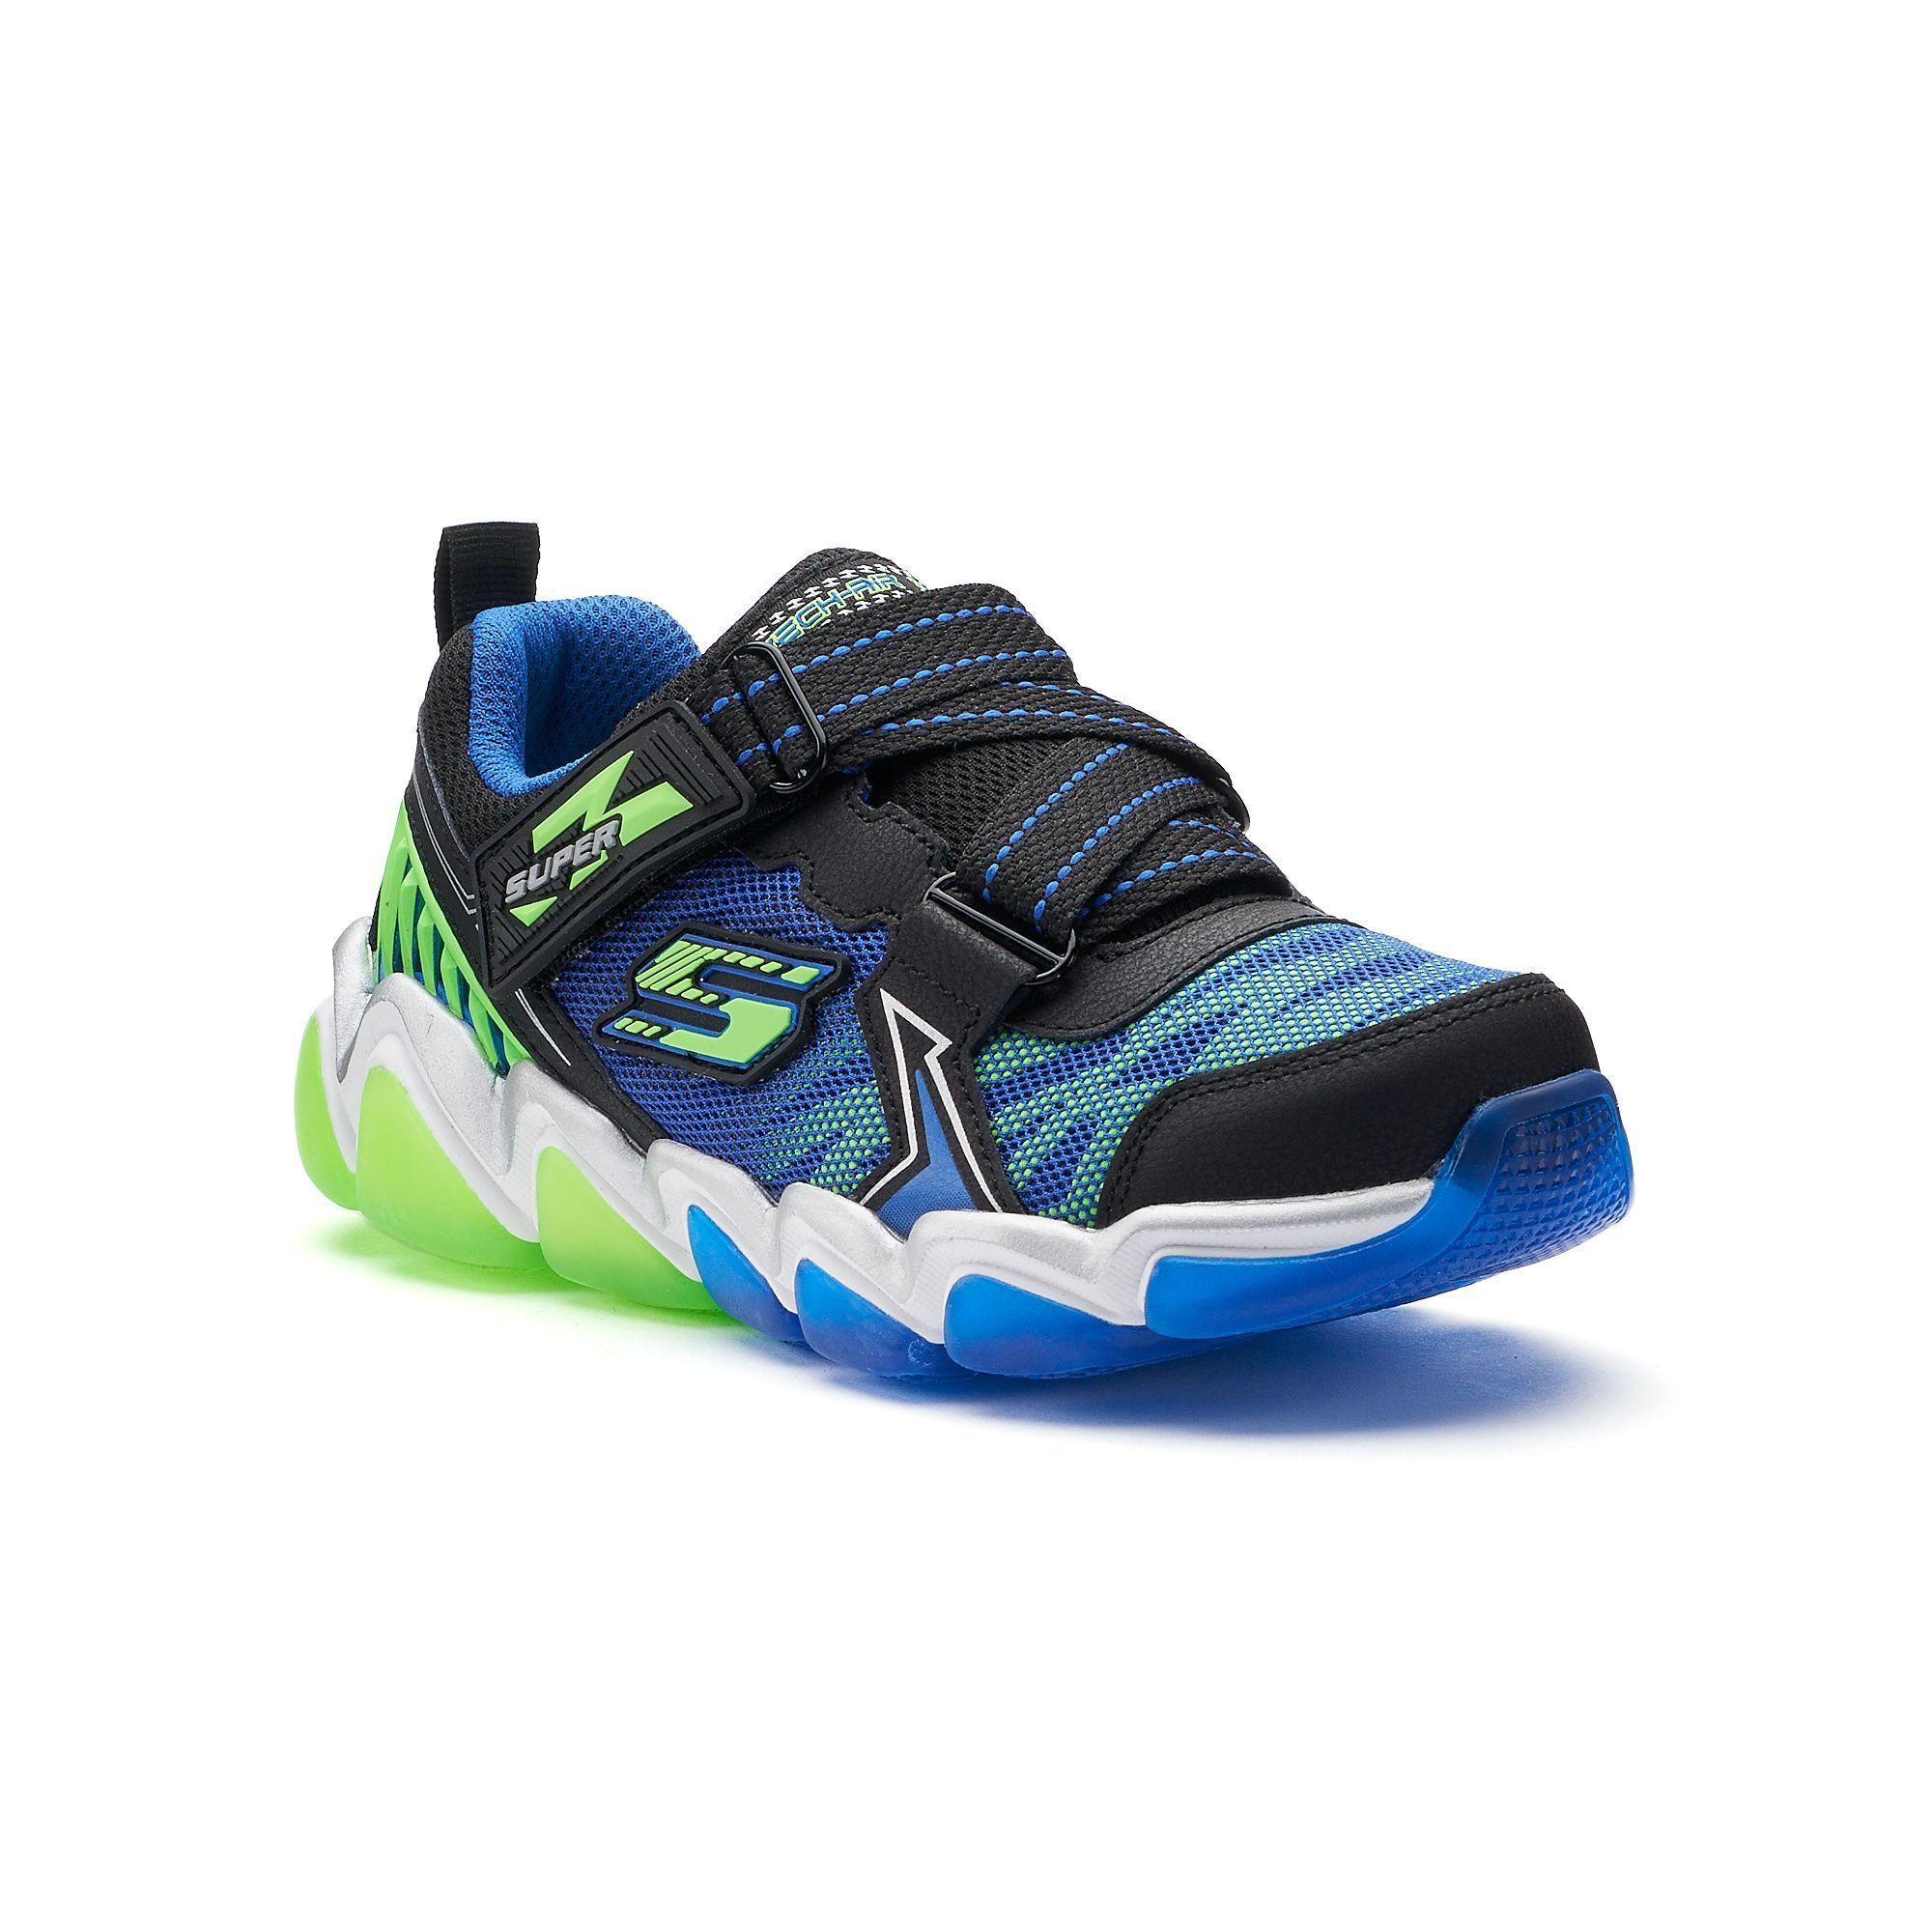 52e10f01e7c6 Skechers Skech Air Kids Boys  Sneakers